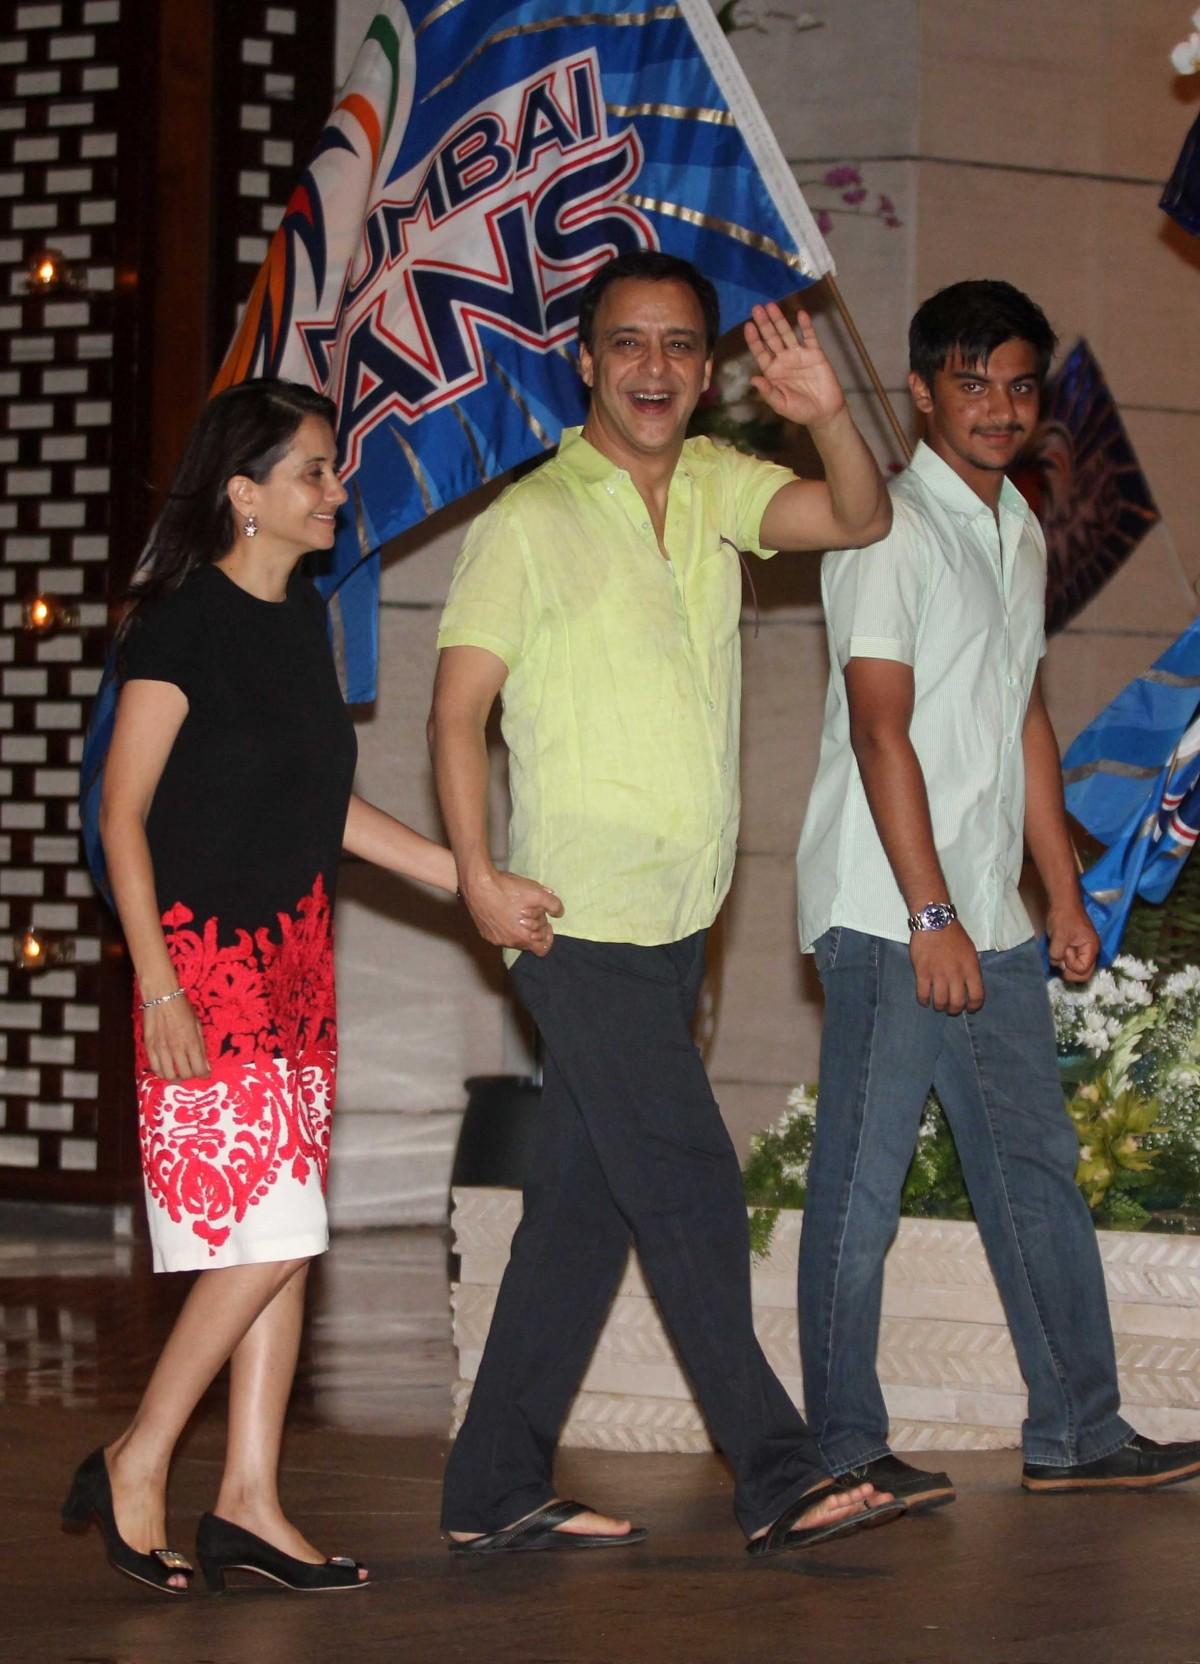 Aishwarya Rai, Abhishek Bachchan and Other B-Town Celebs Attend Ambani's Victory Bash for Mumbai Indians